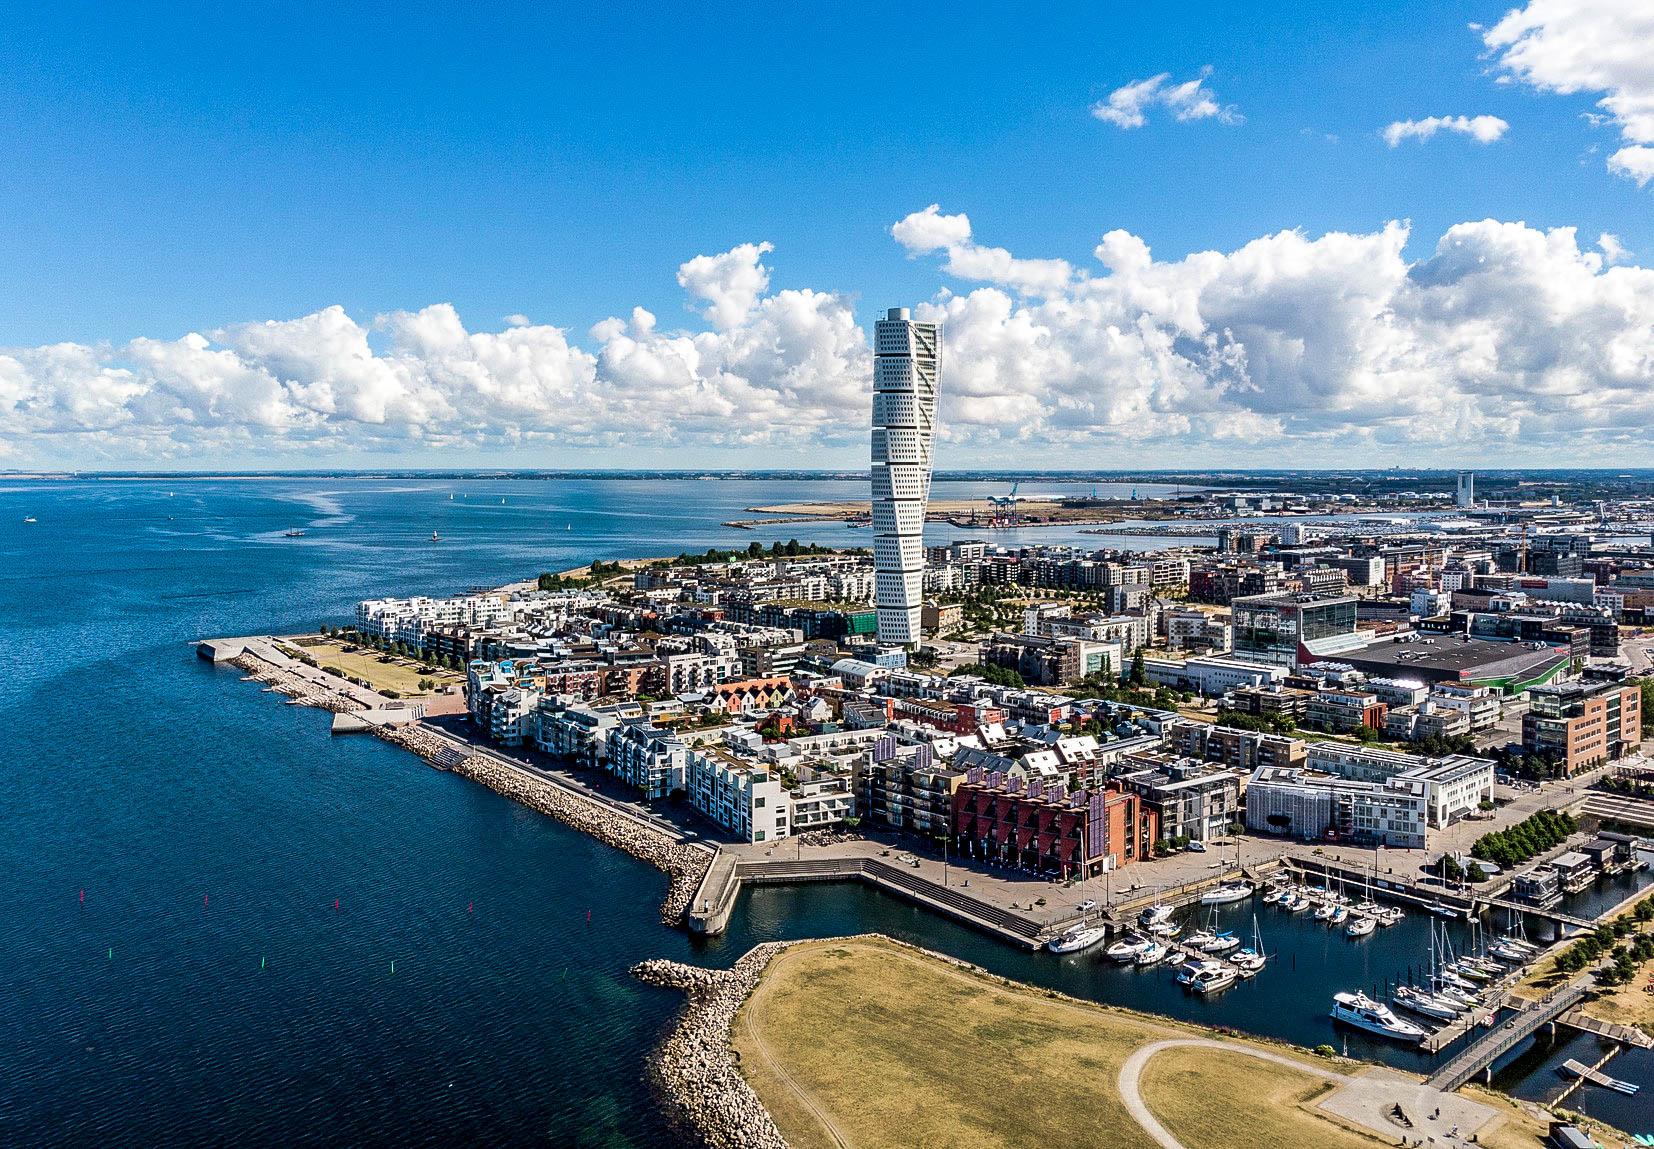 Sveriges största städer - Malmö